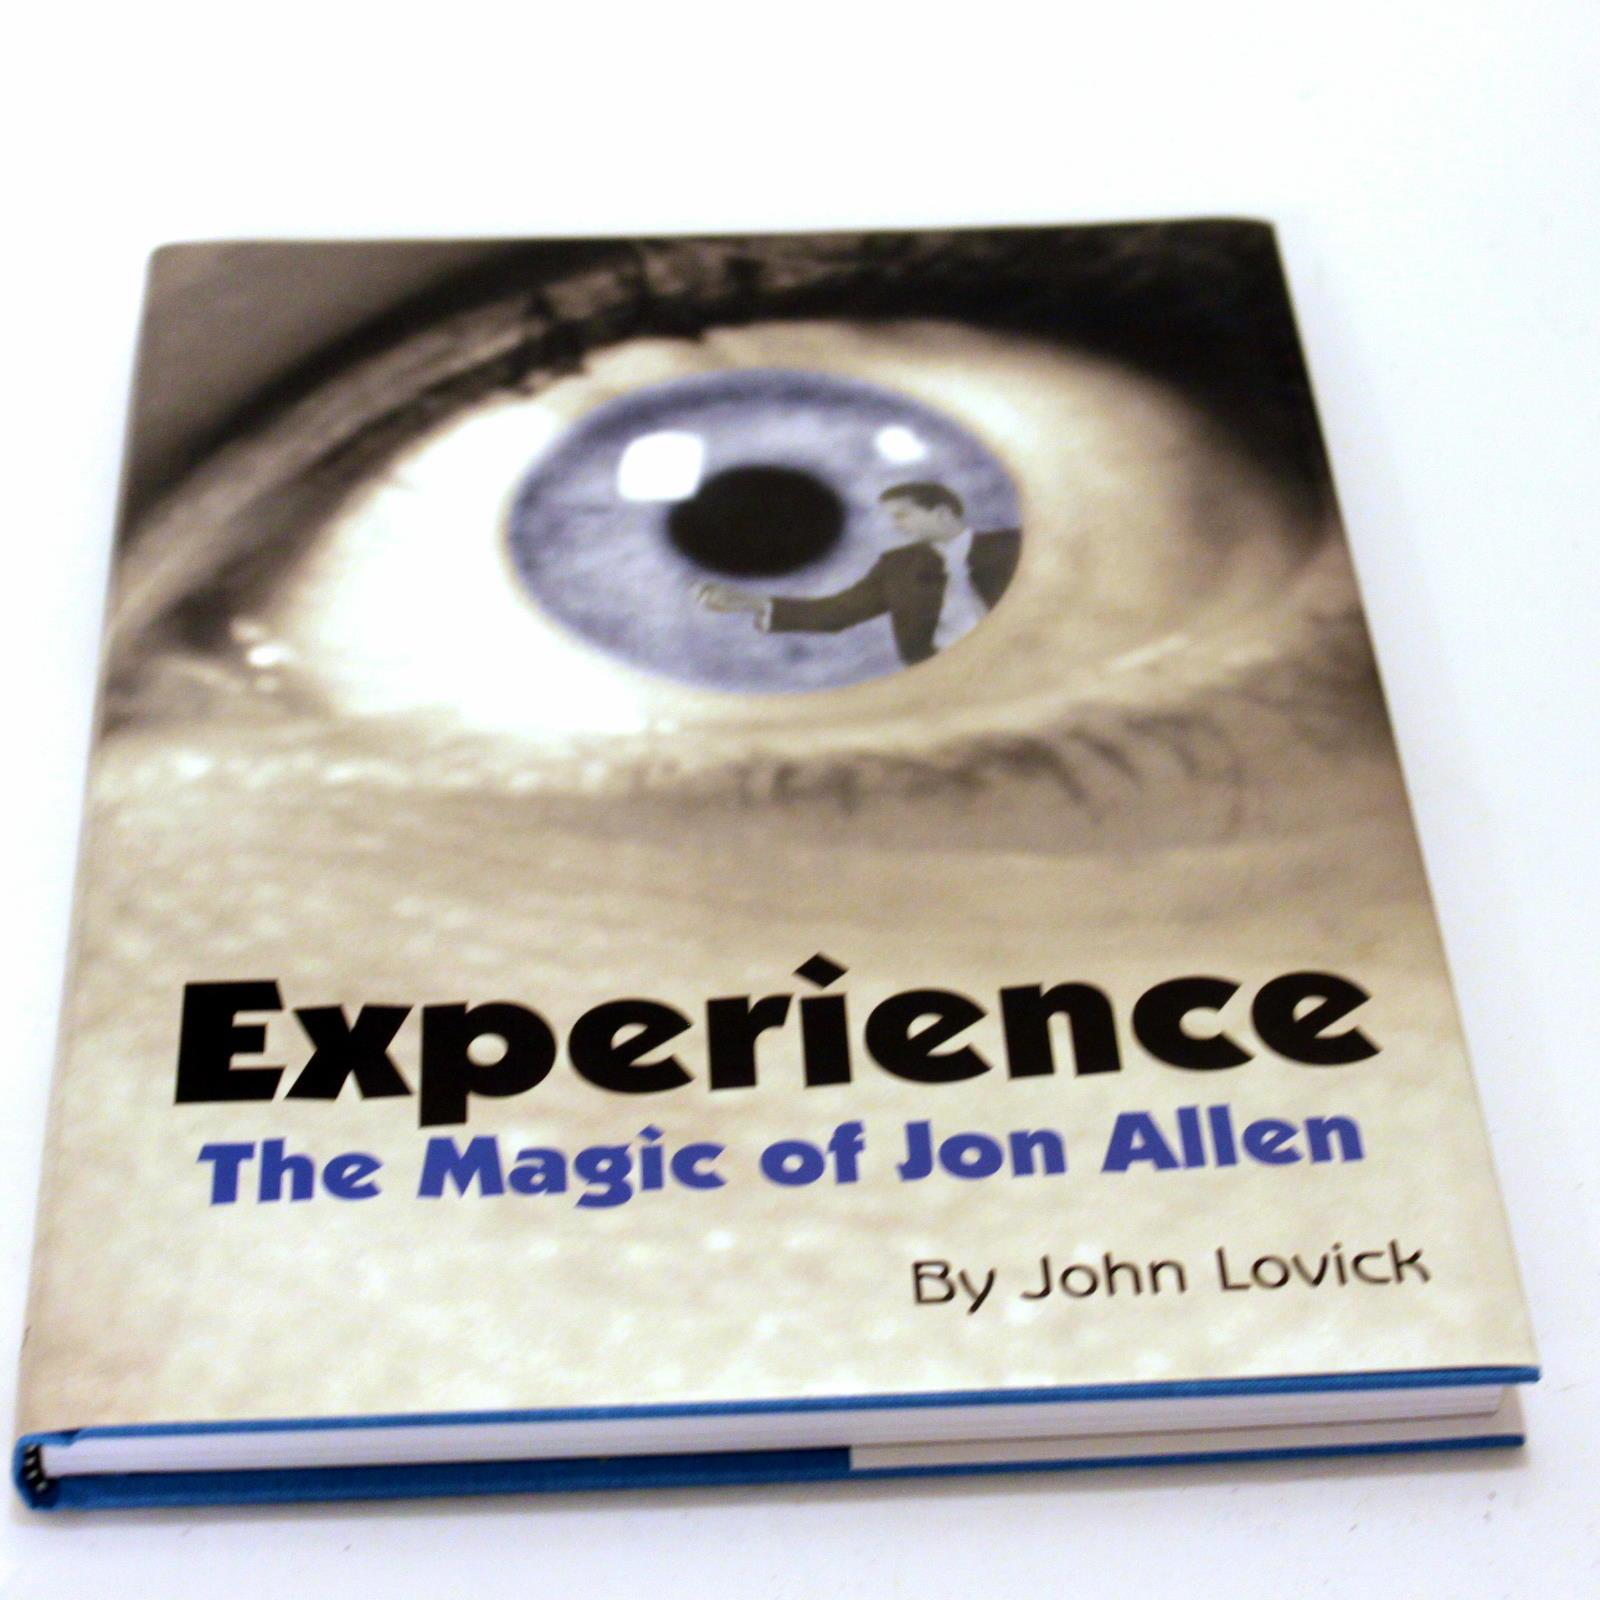 Experience The Magic of Jon Allen by John Lovick